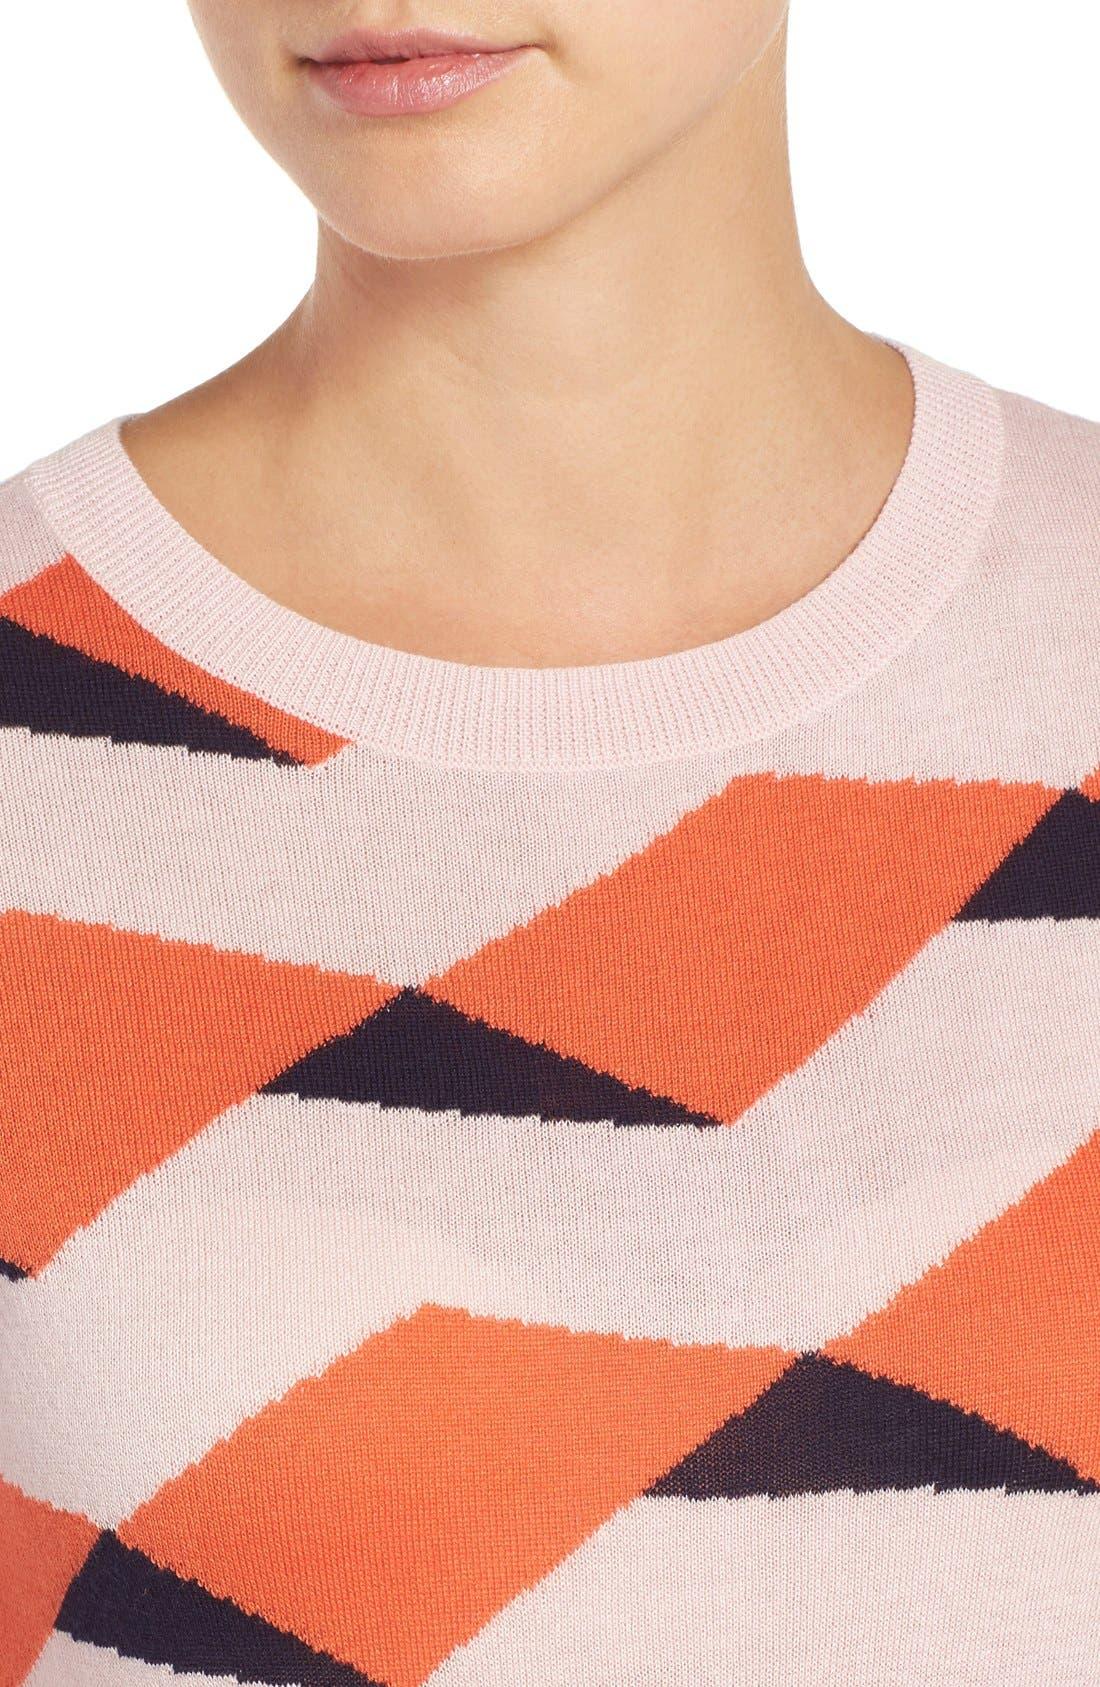 Cotton Blend Pullover,                             Alternate thumbnail 115, color,